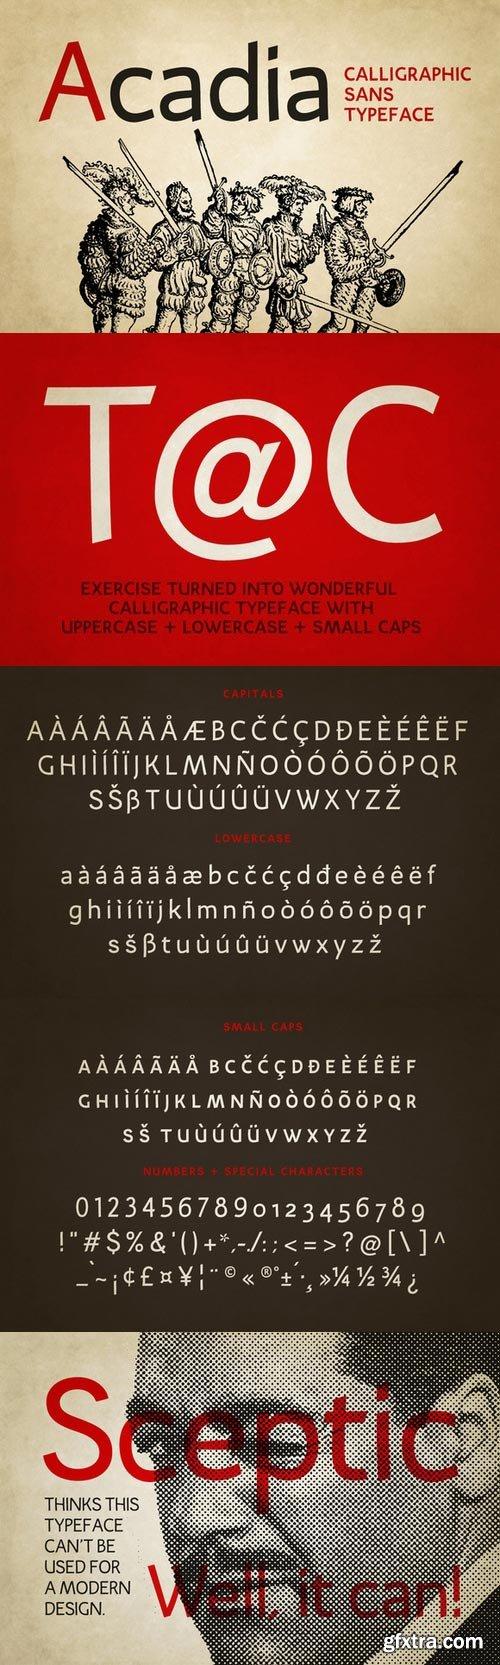 CM - Acadia typeface 333214